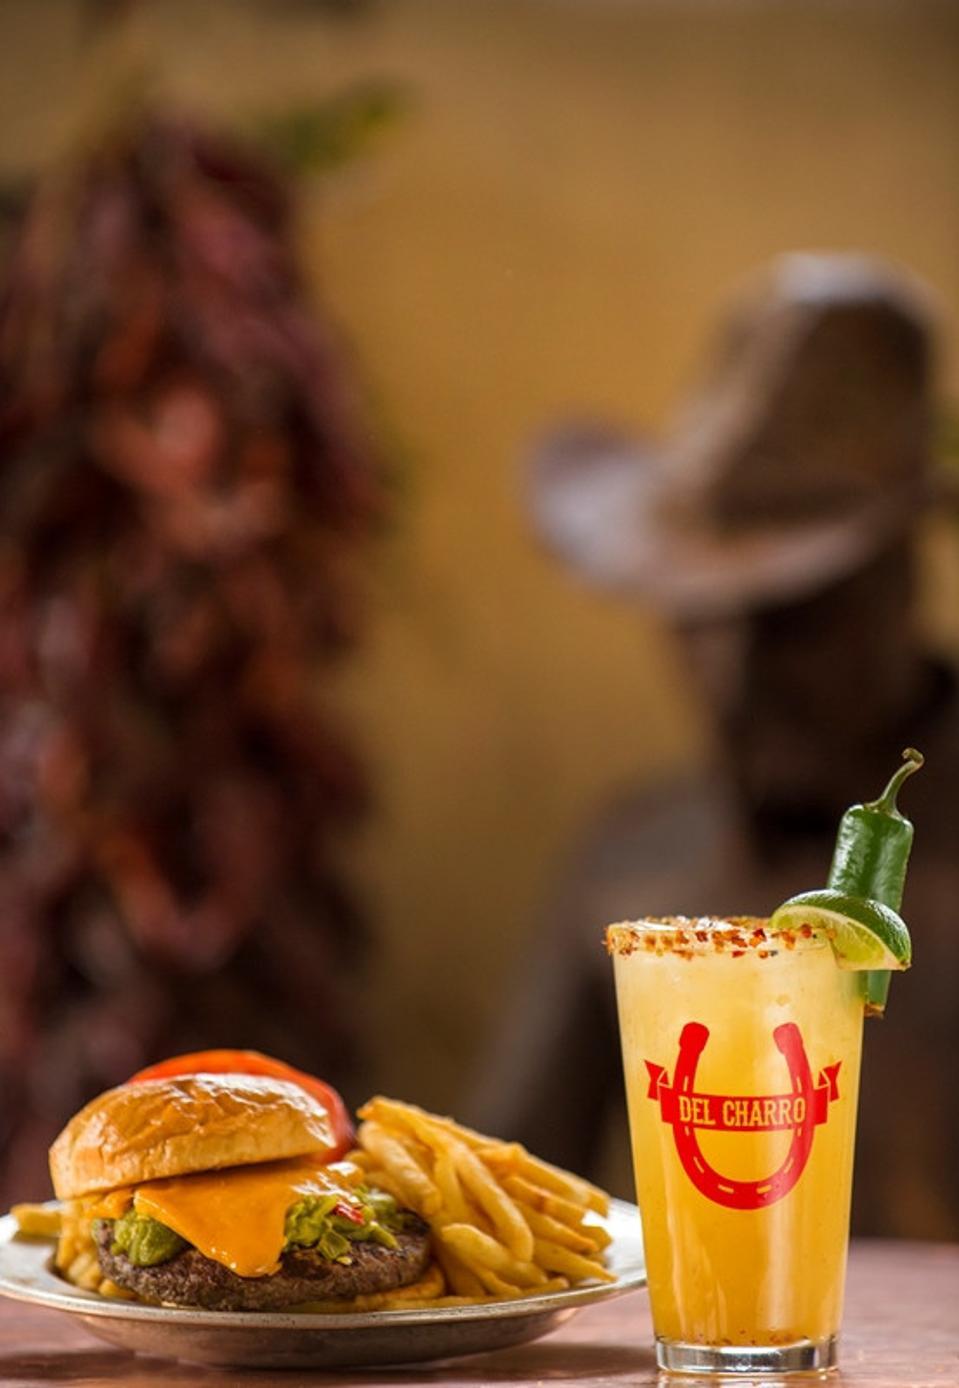 Margarita and cheeseburger.